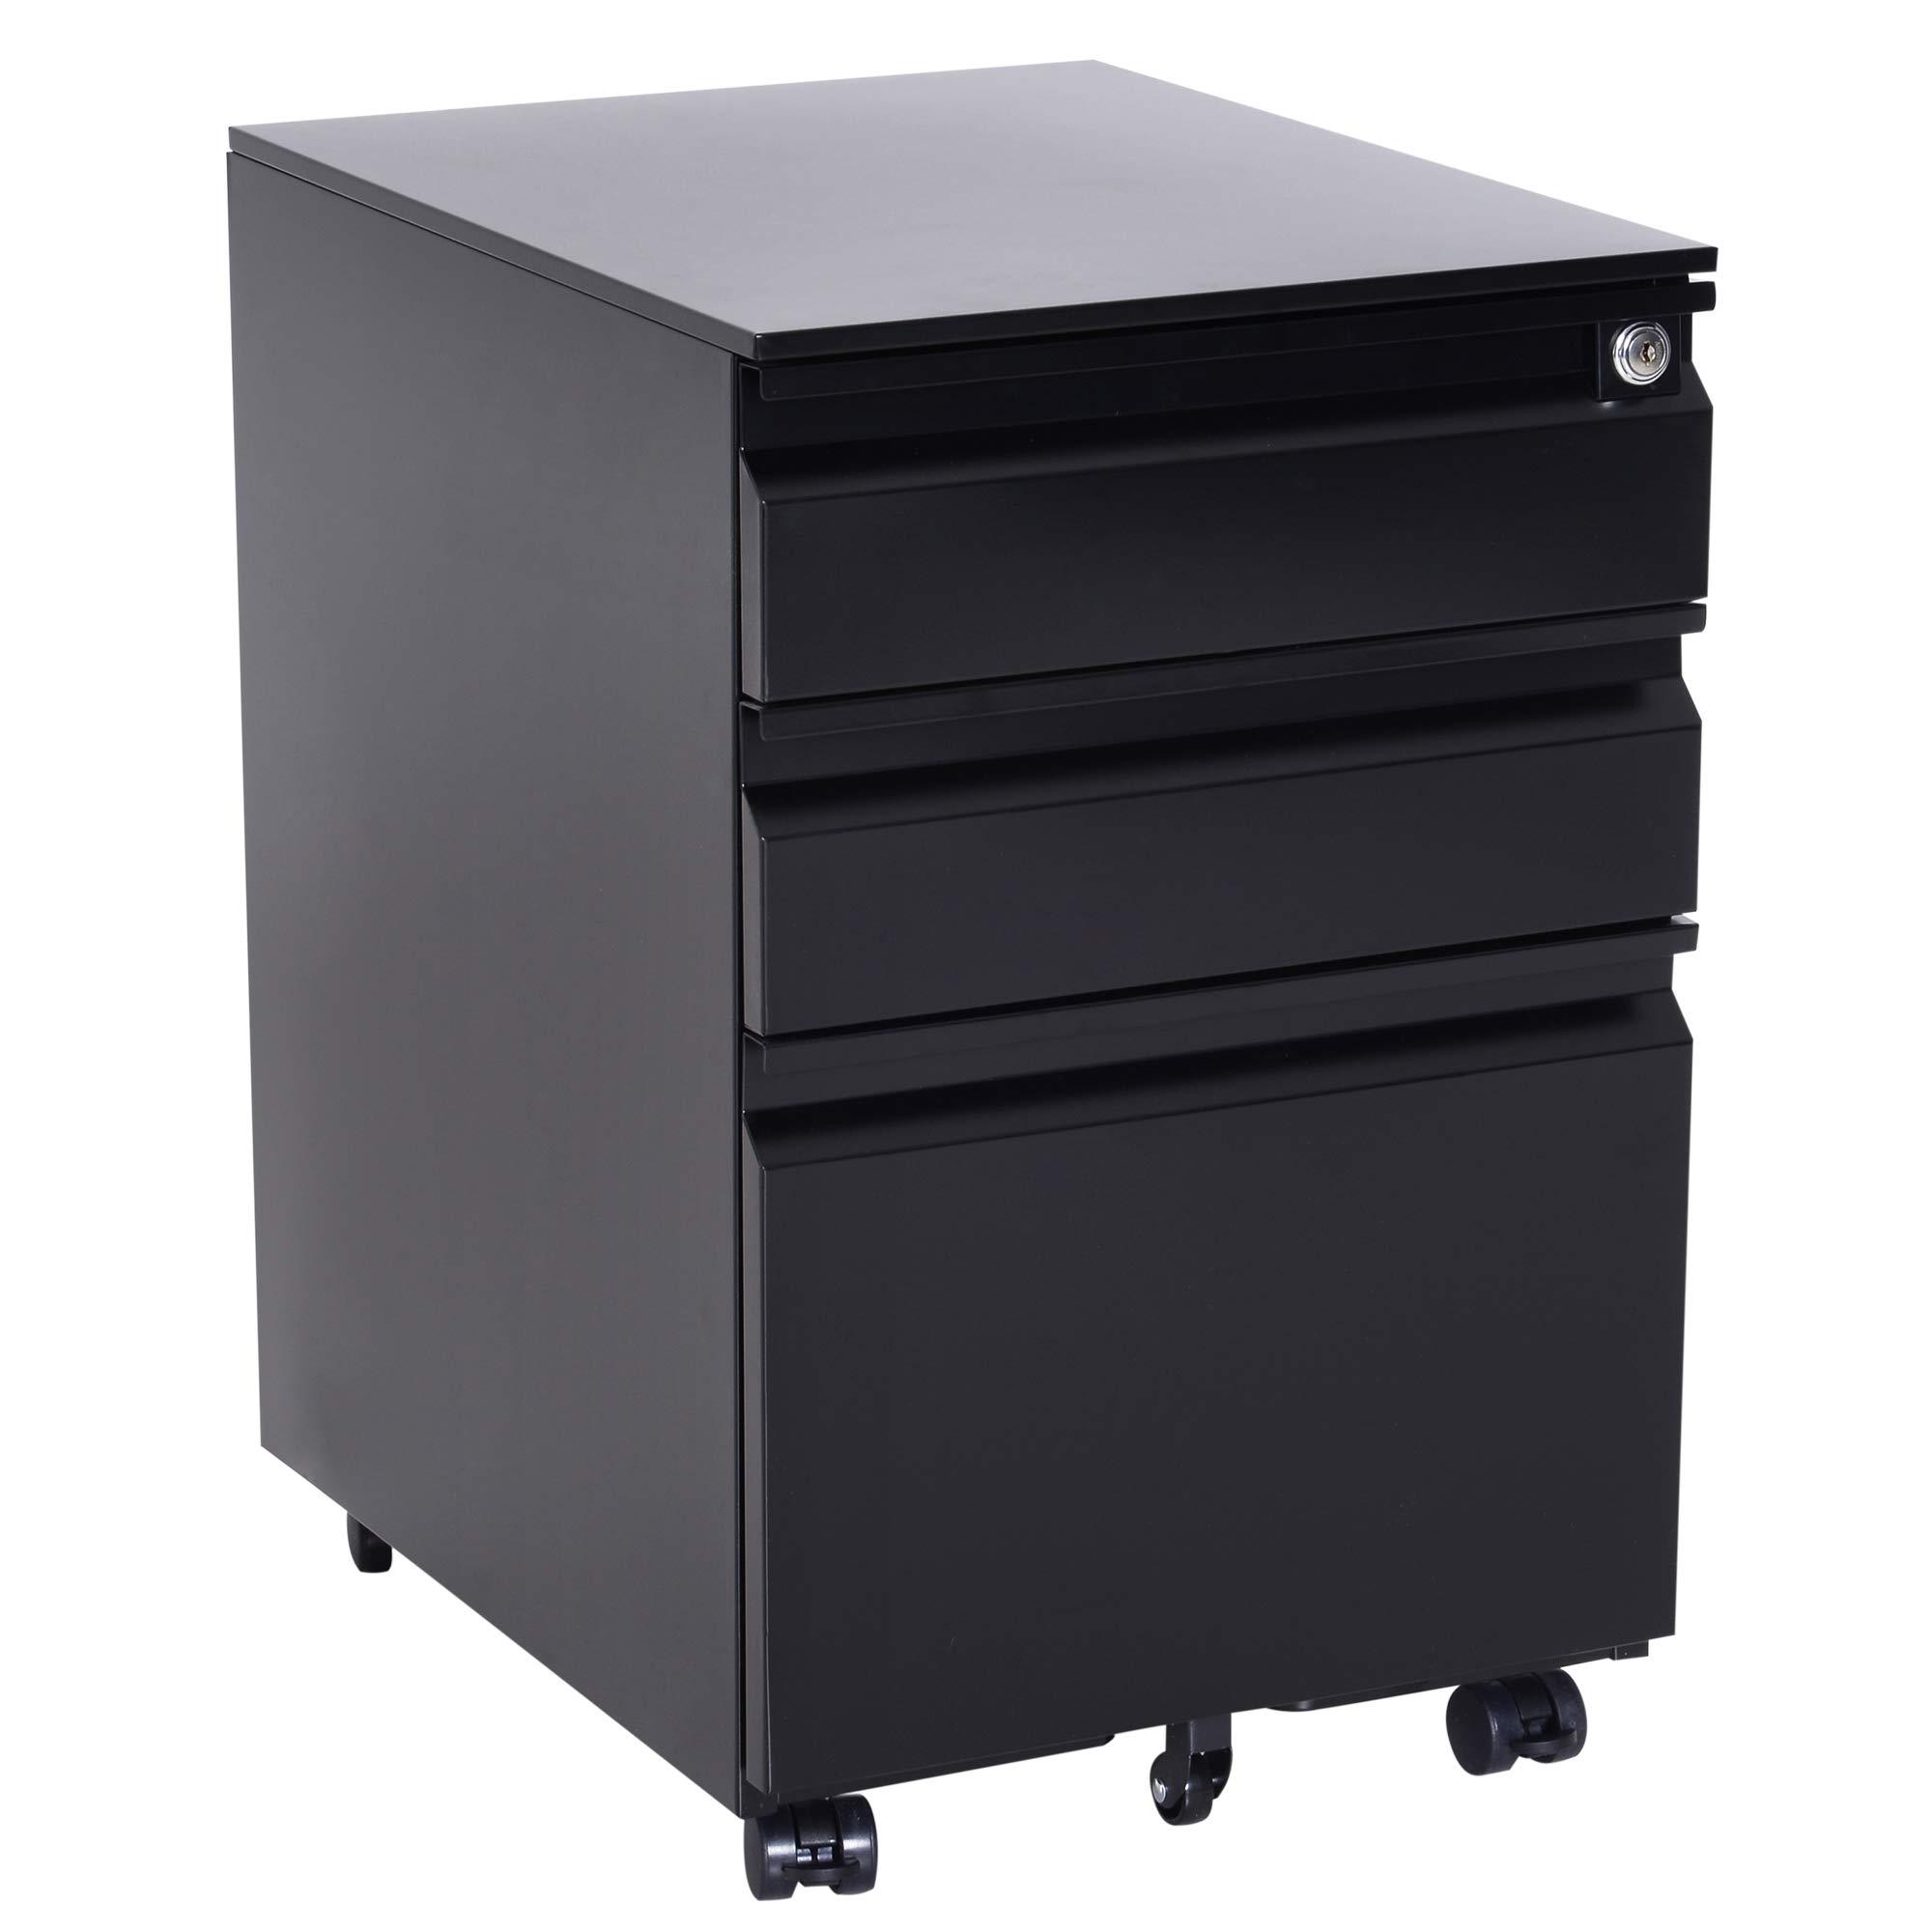 HOMCOM 24'' Steel 3 Drawer Locking File Cabinet on Wheels - Black